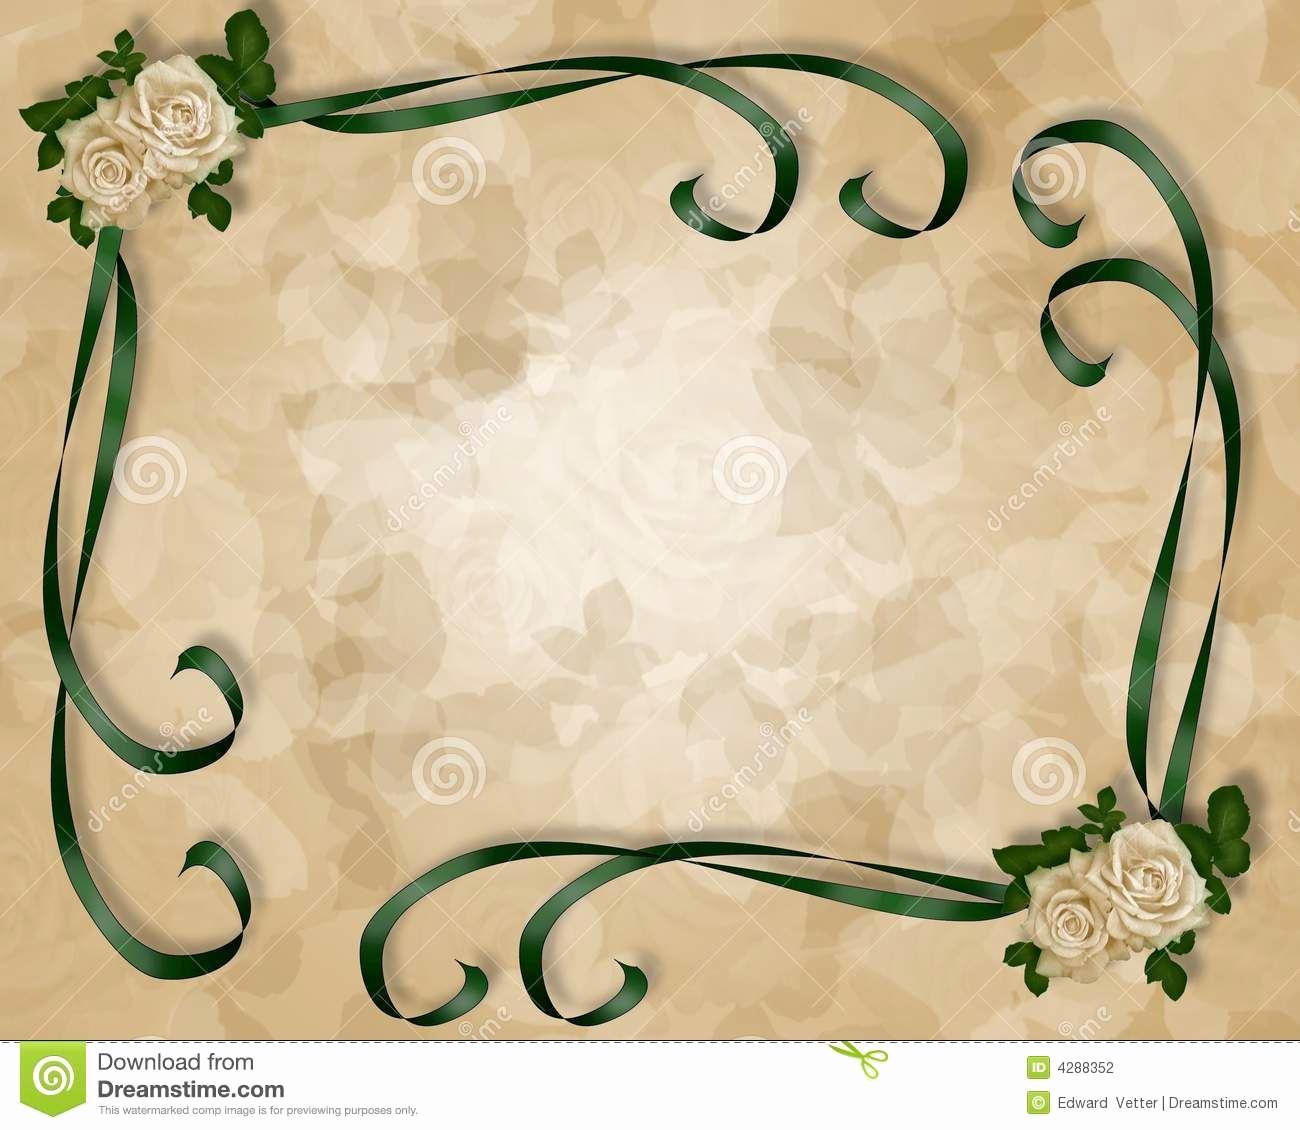 Blank Wedding Invitation Templates Fresh Wedding Invitation Template Stock Graphy Image